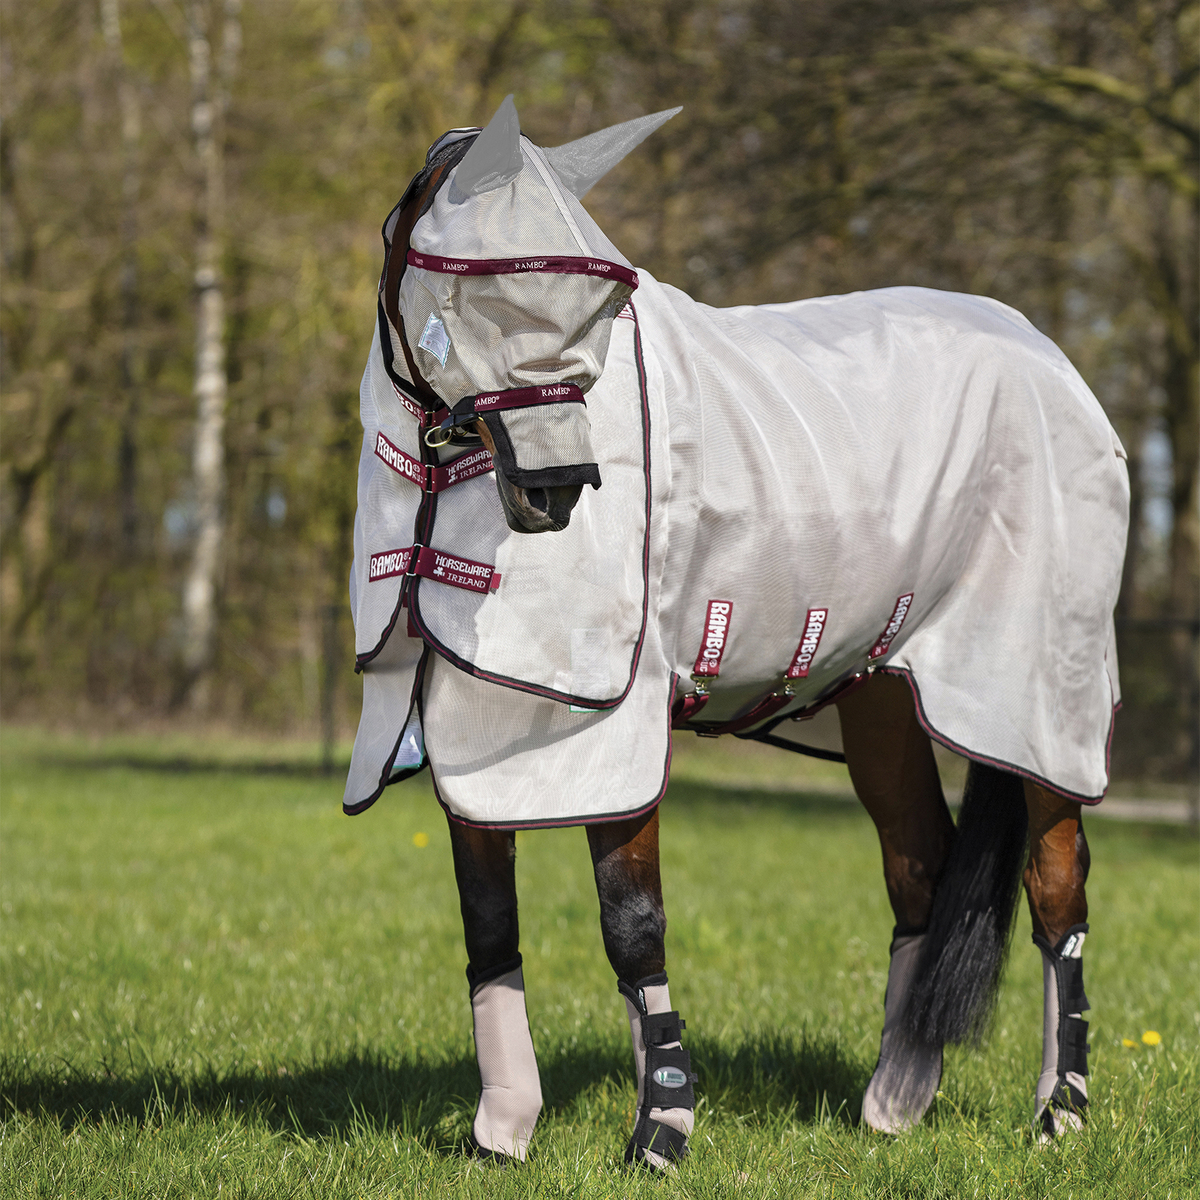 Horseware Rambo Softie Fleece - Thomas Irvings equestrian